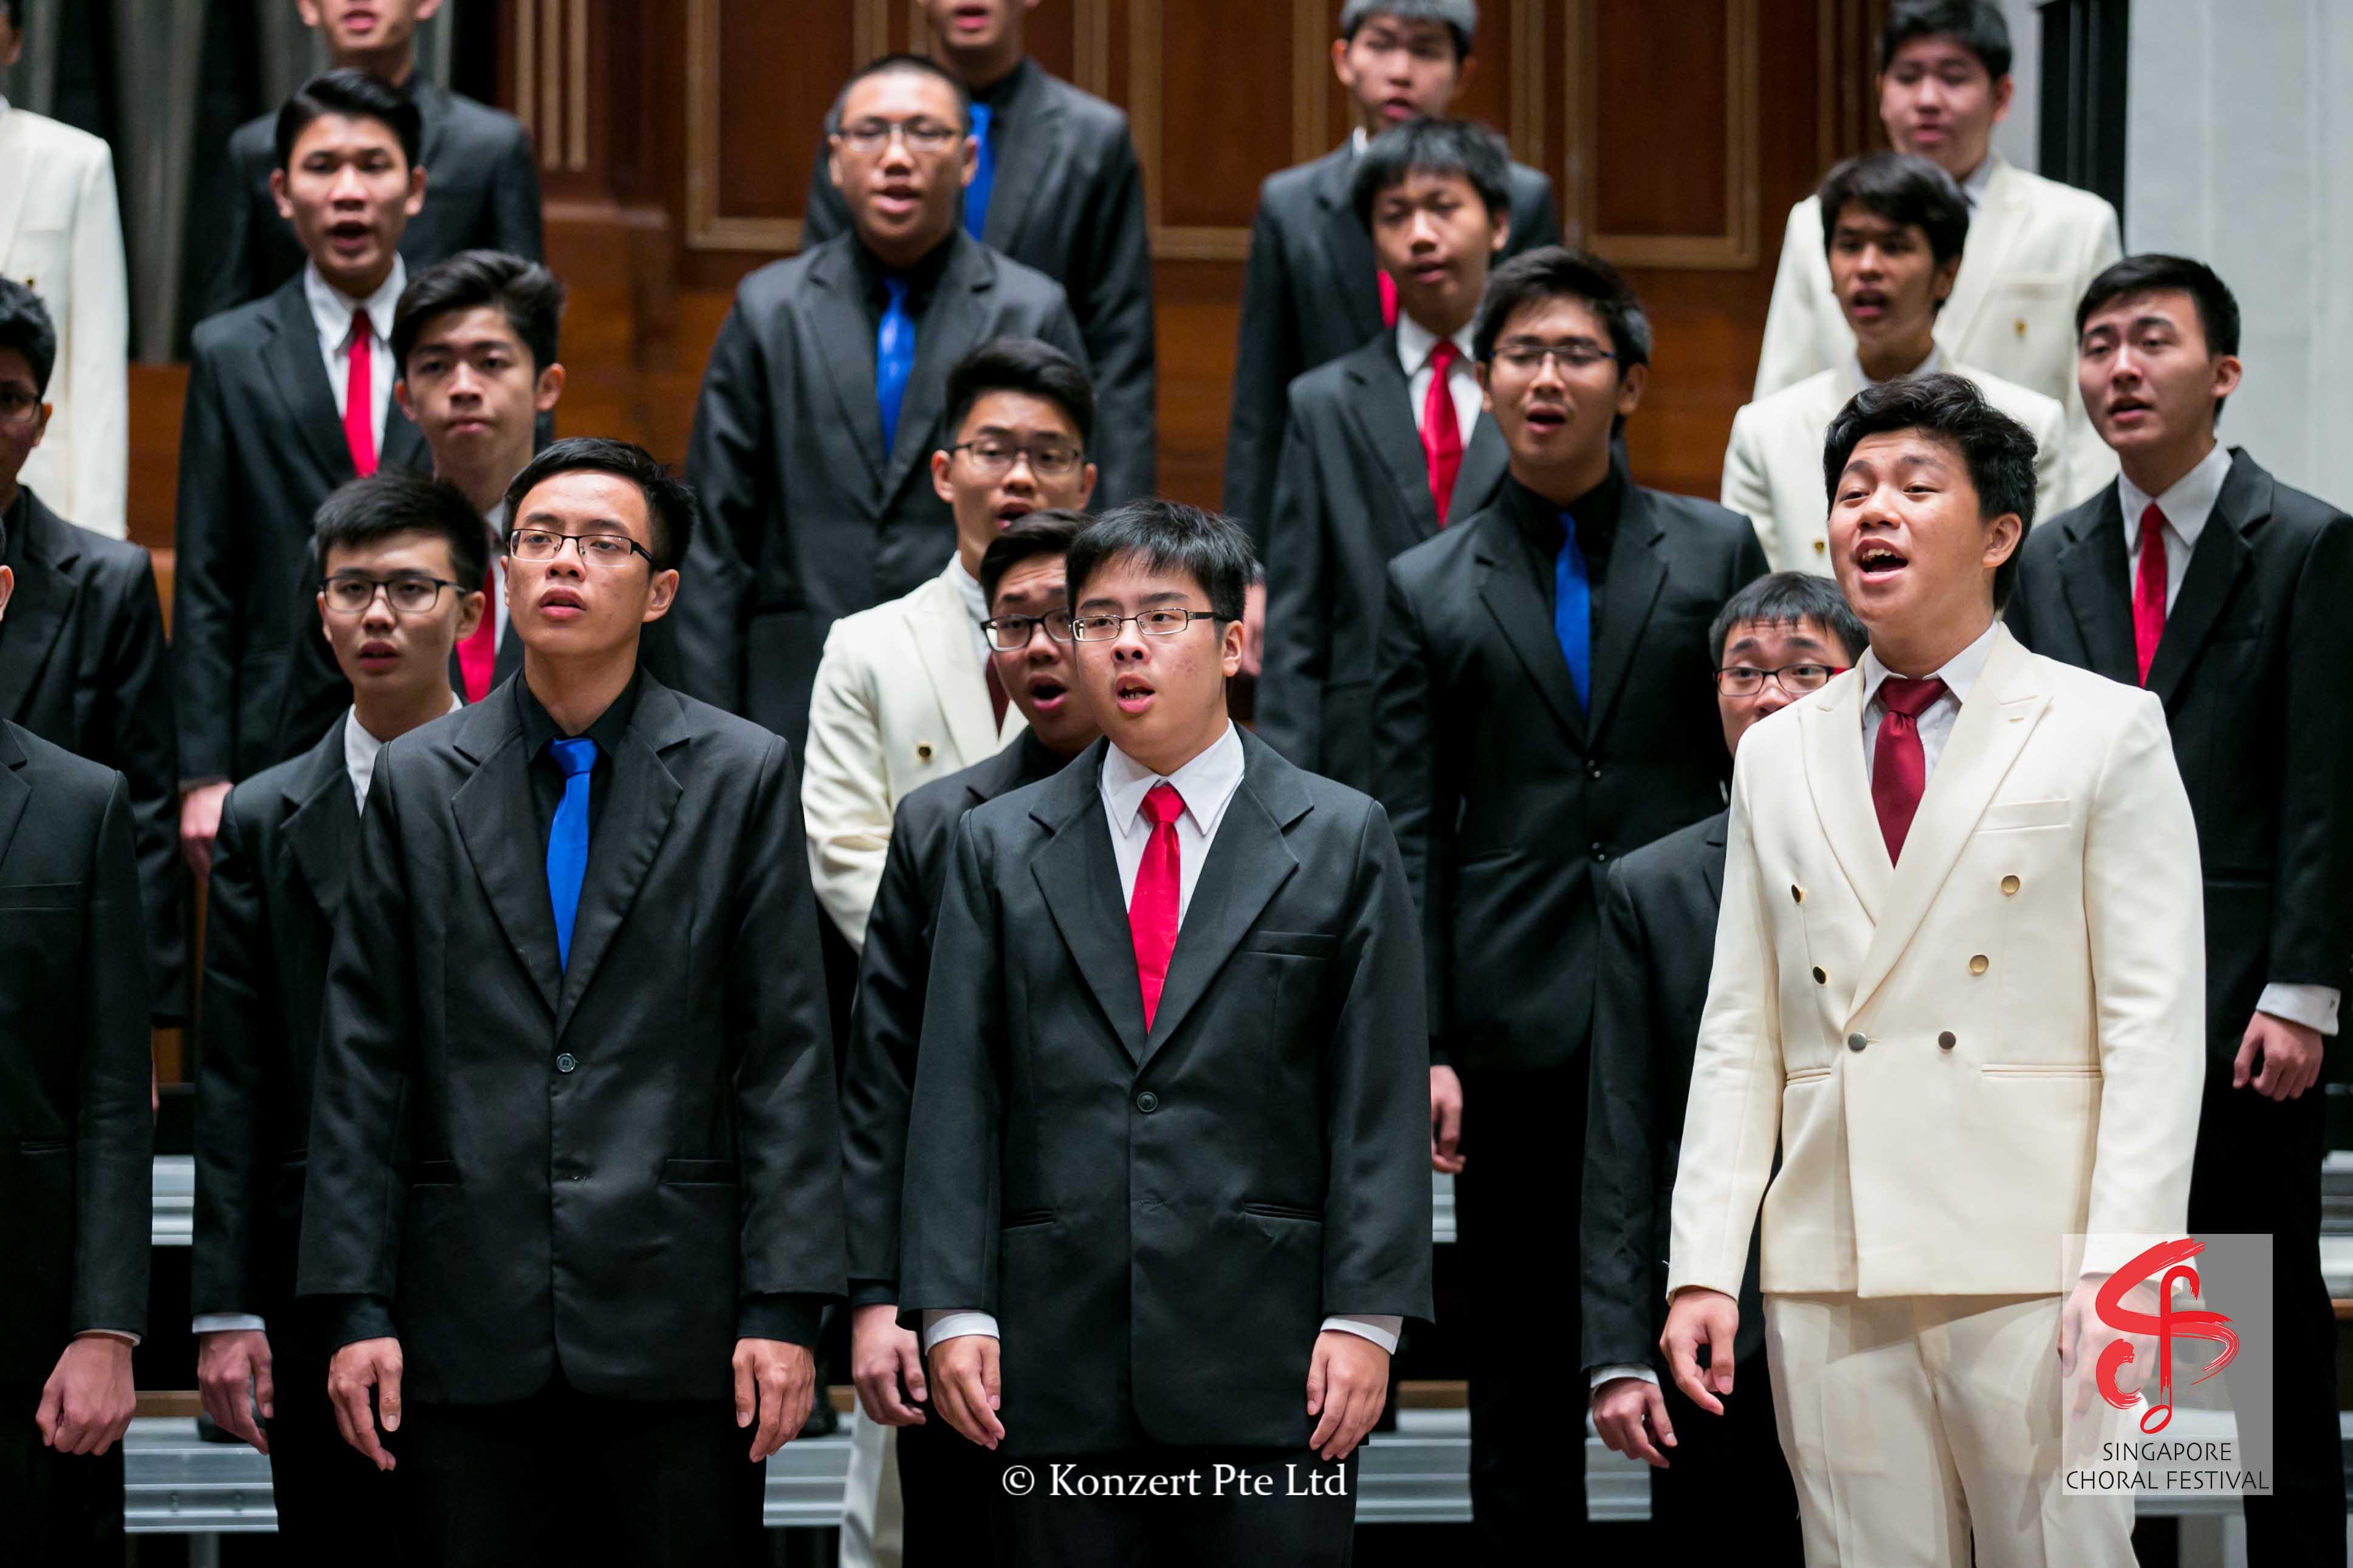 Singapore Choral Festival 7-8-15 (143).jpg